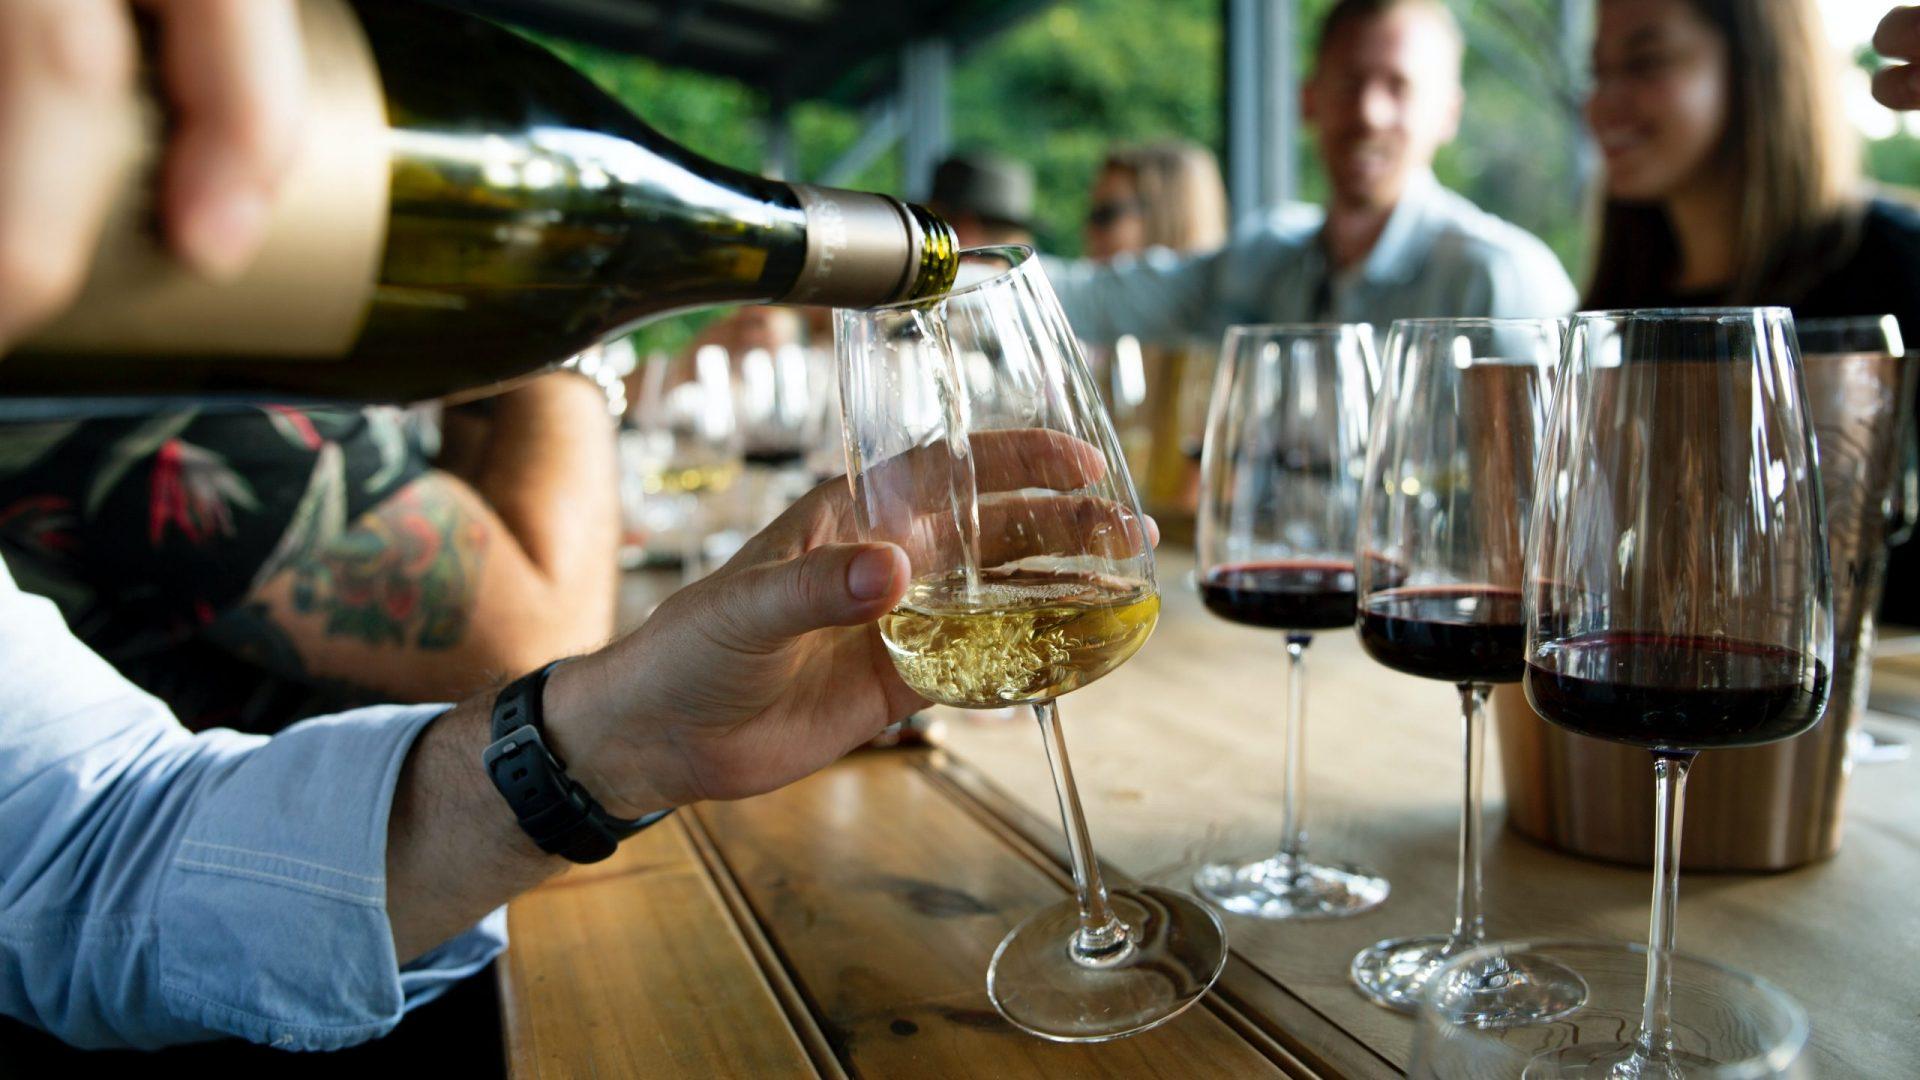 EXCLUSIVE WINE TASTING WITH CARMEN STEVENS